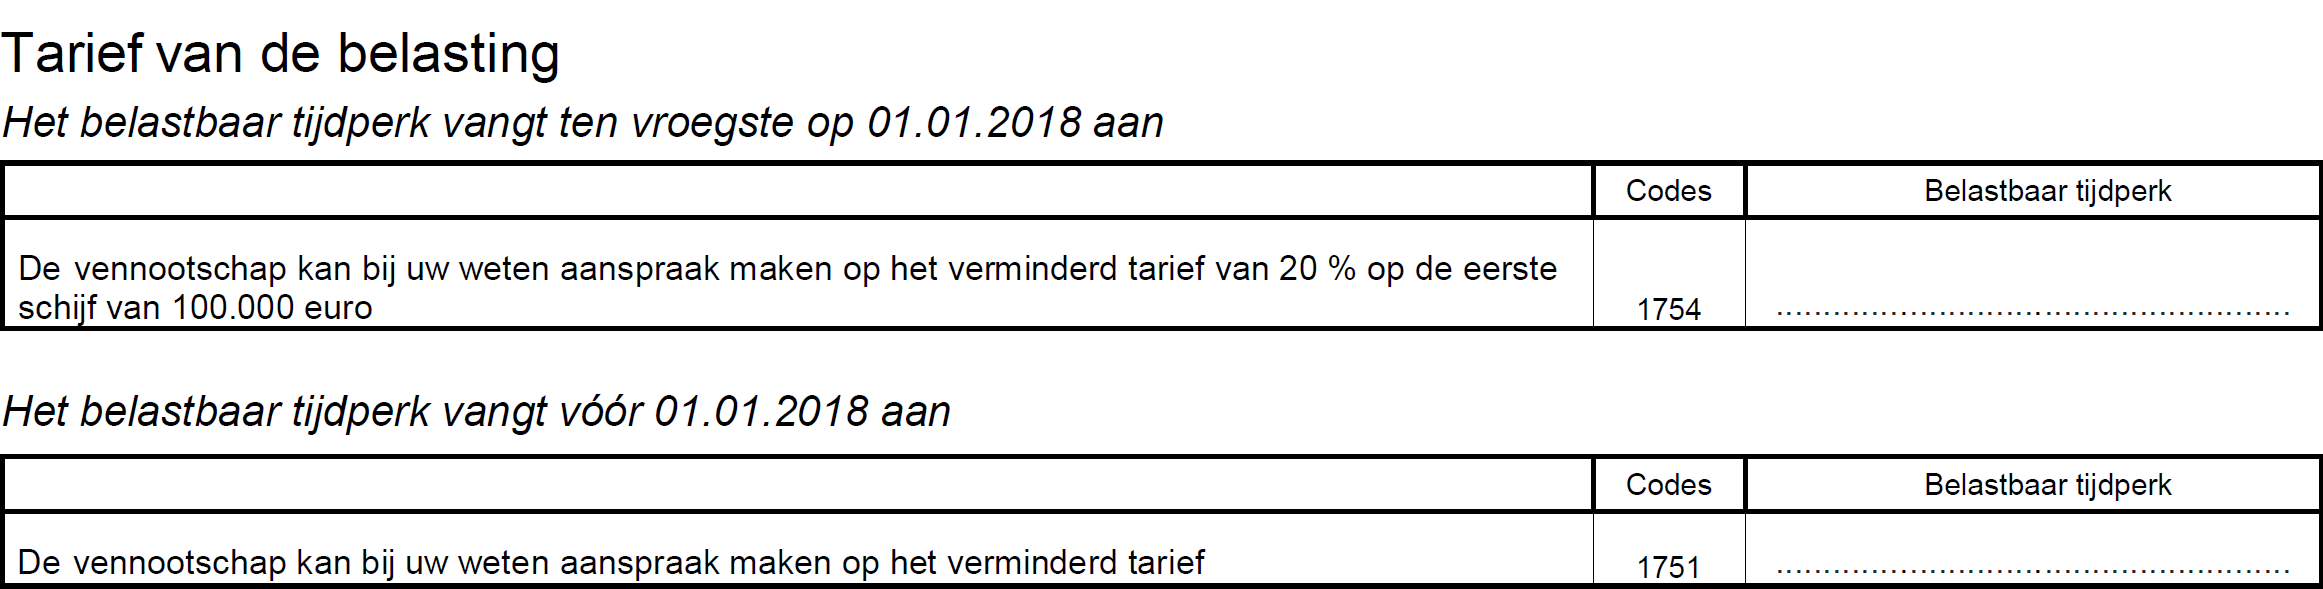 Tarief van de belasting AJ 2019